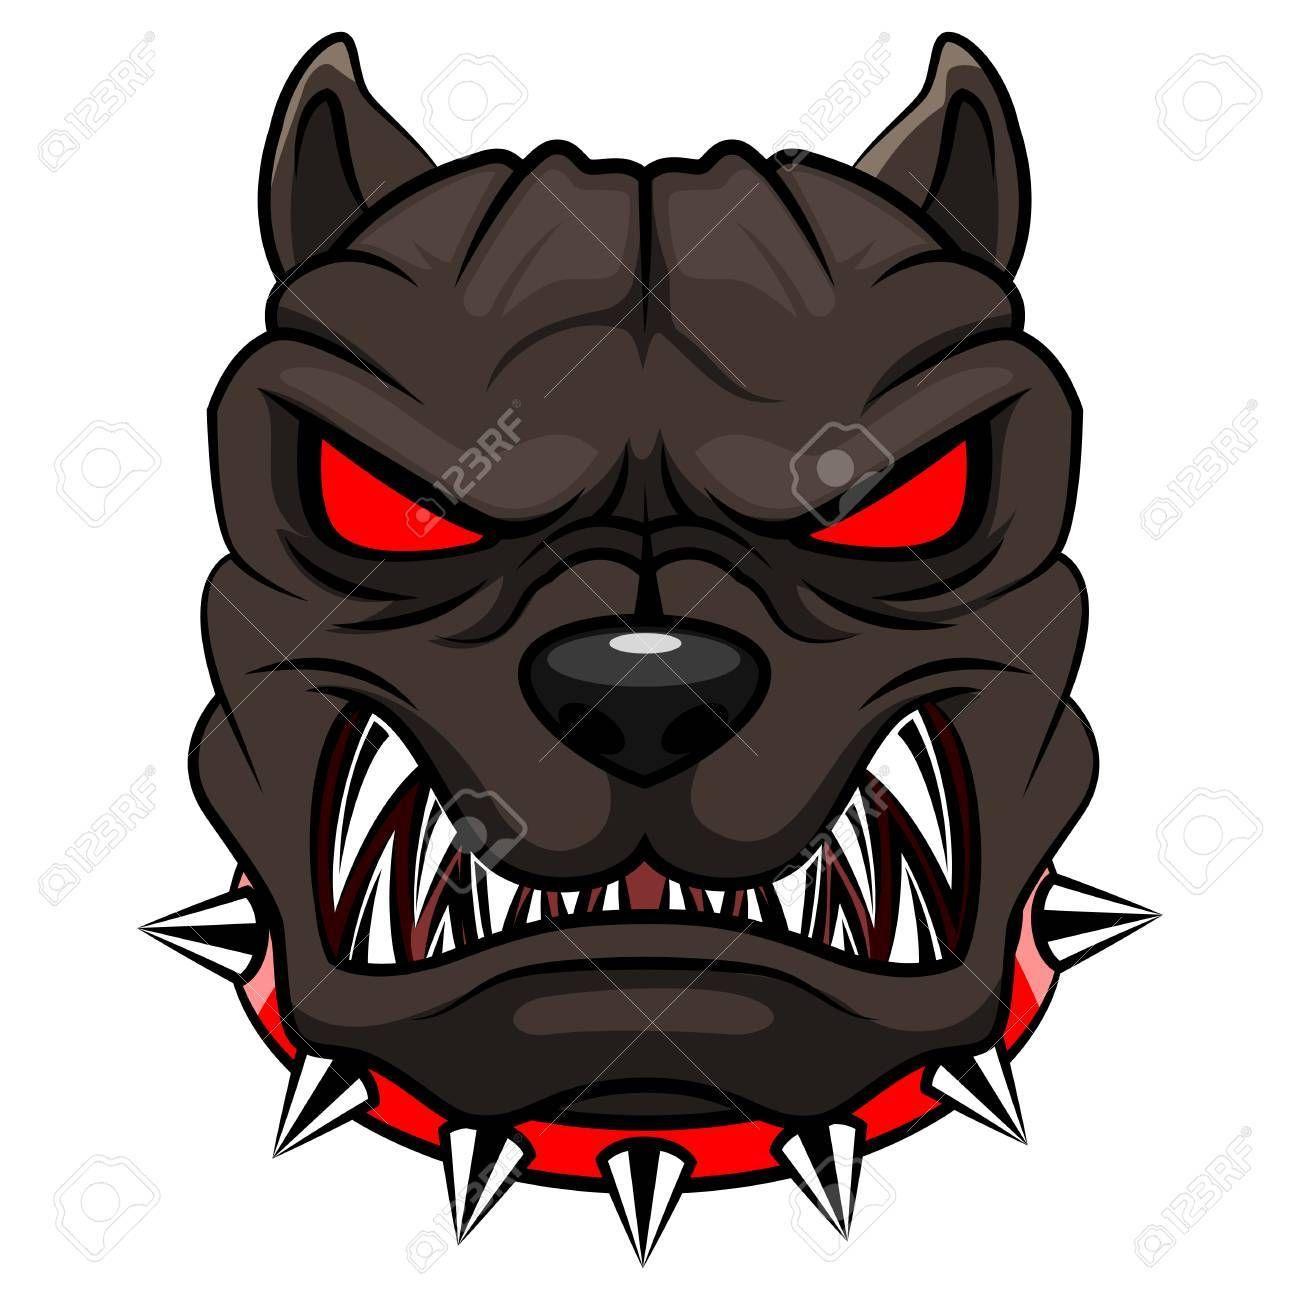 Angry Dog Mascot Cartoon Vector Illustration Affiliate Mascot Dog Angry Illustration Vector Angry Dog Digital Design Trends Mascot